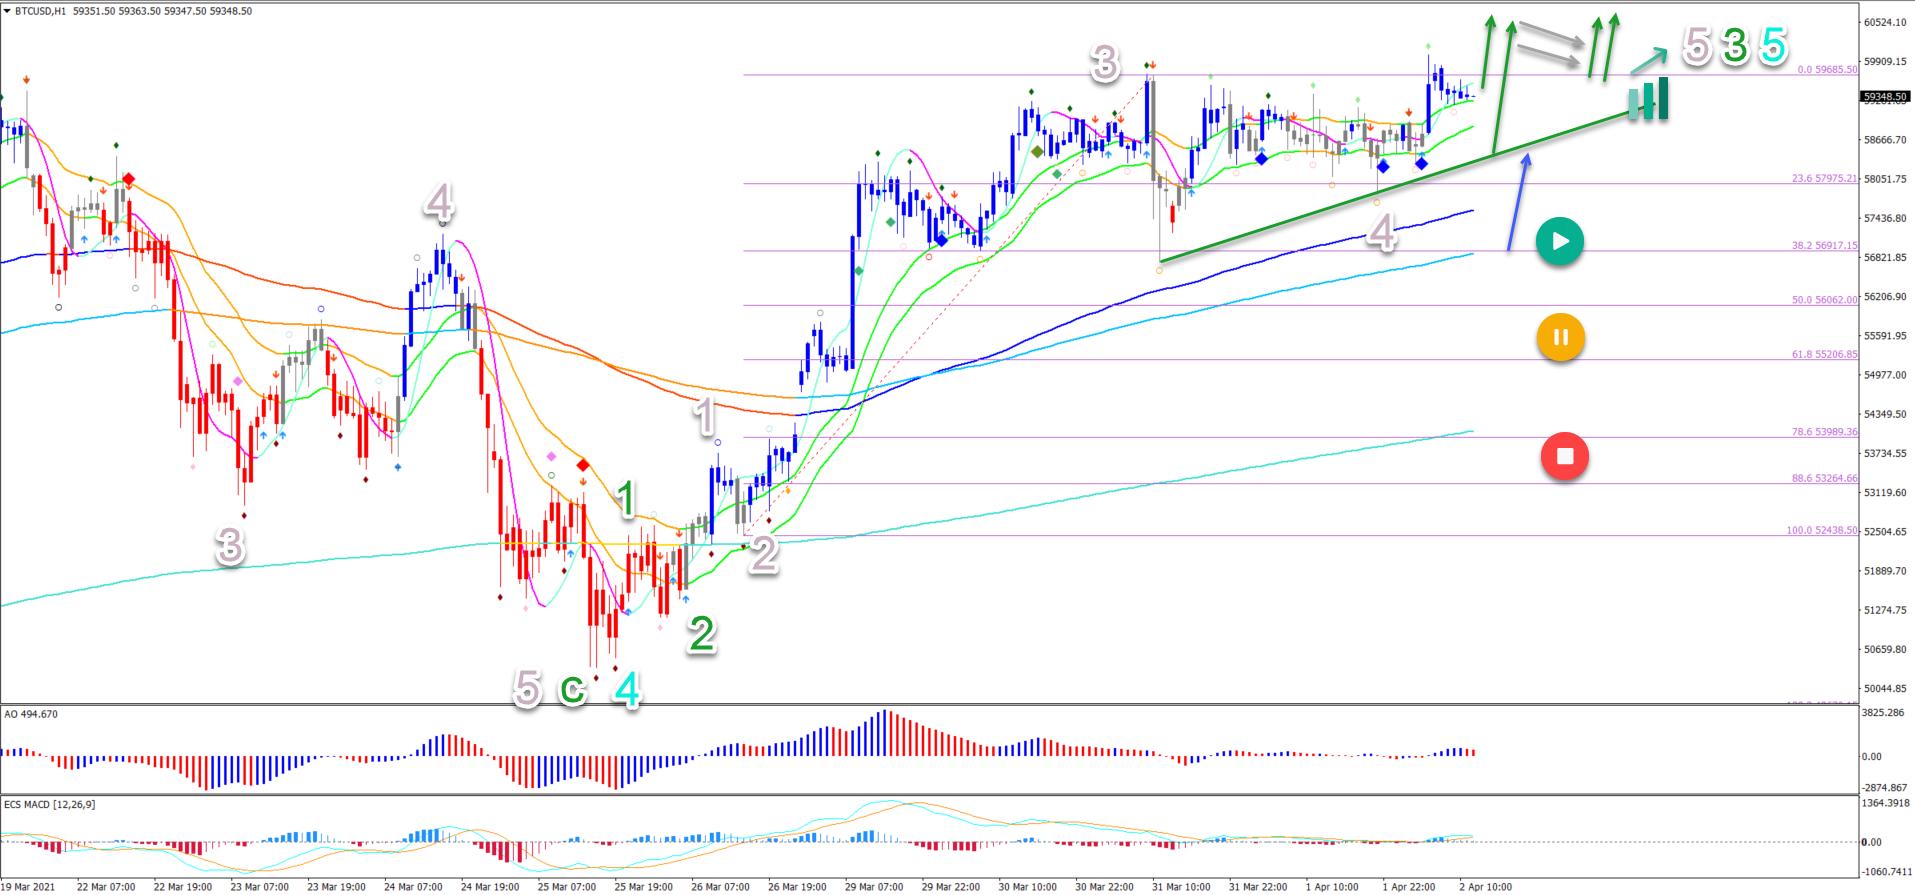 BTC/USD 2.4.2021 1 hour chart